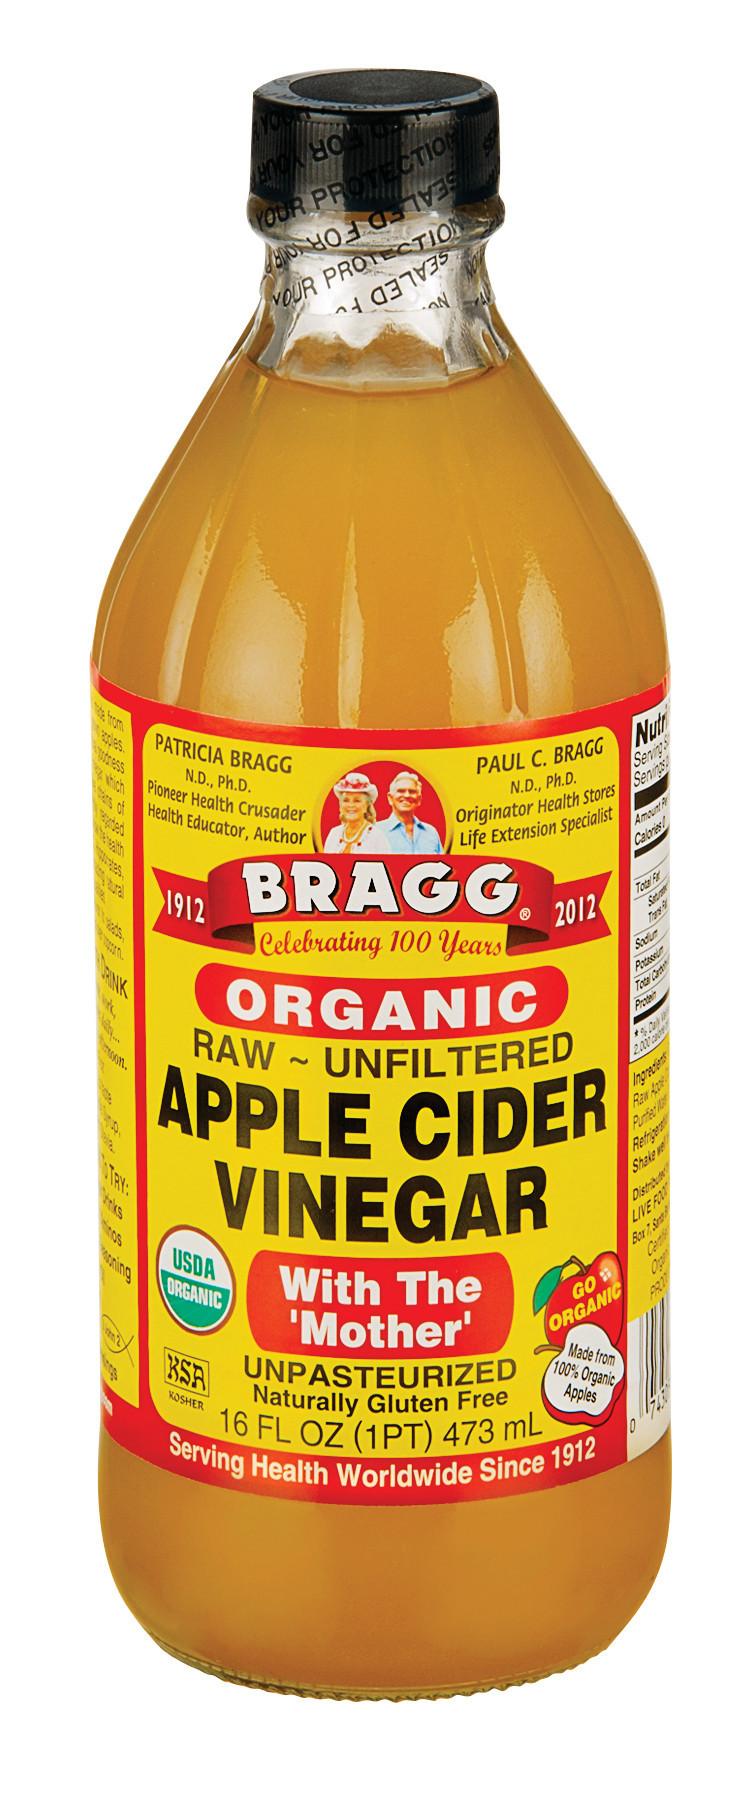 Is apple cider vinegar really good for you? - Chicago Tribune